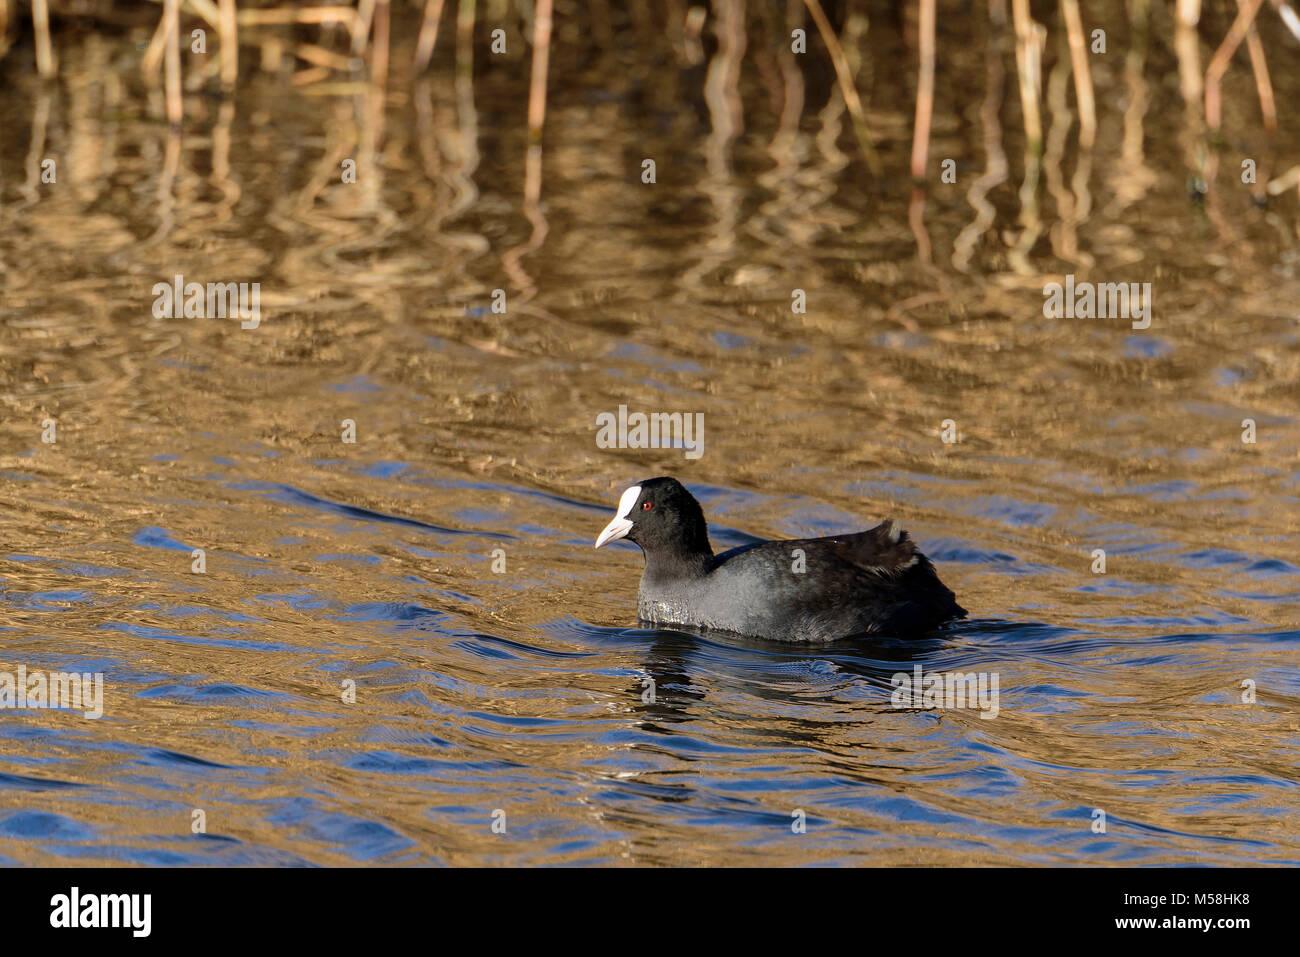 Coot waterfowl bird. - Stock Image